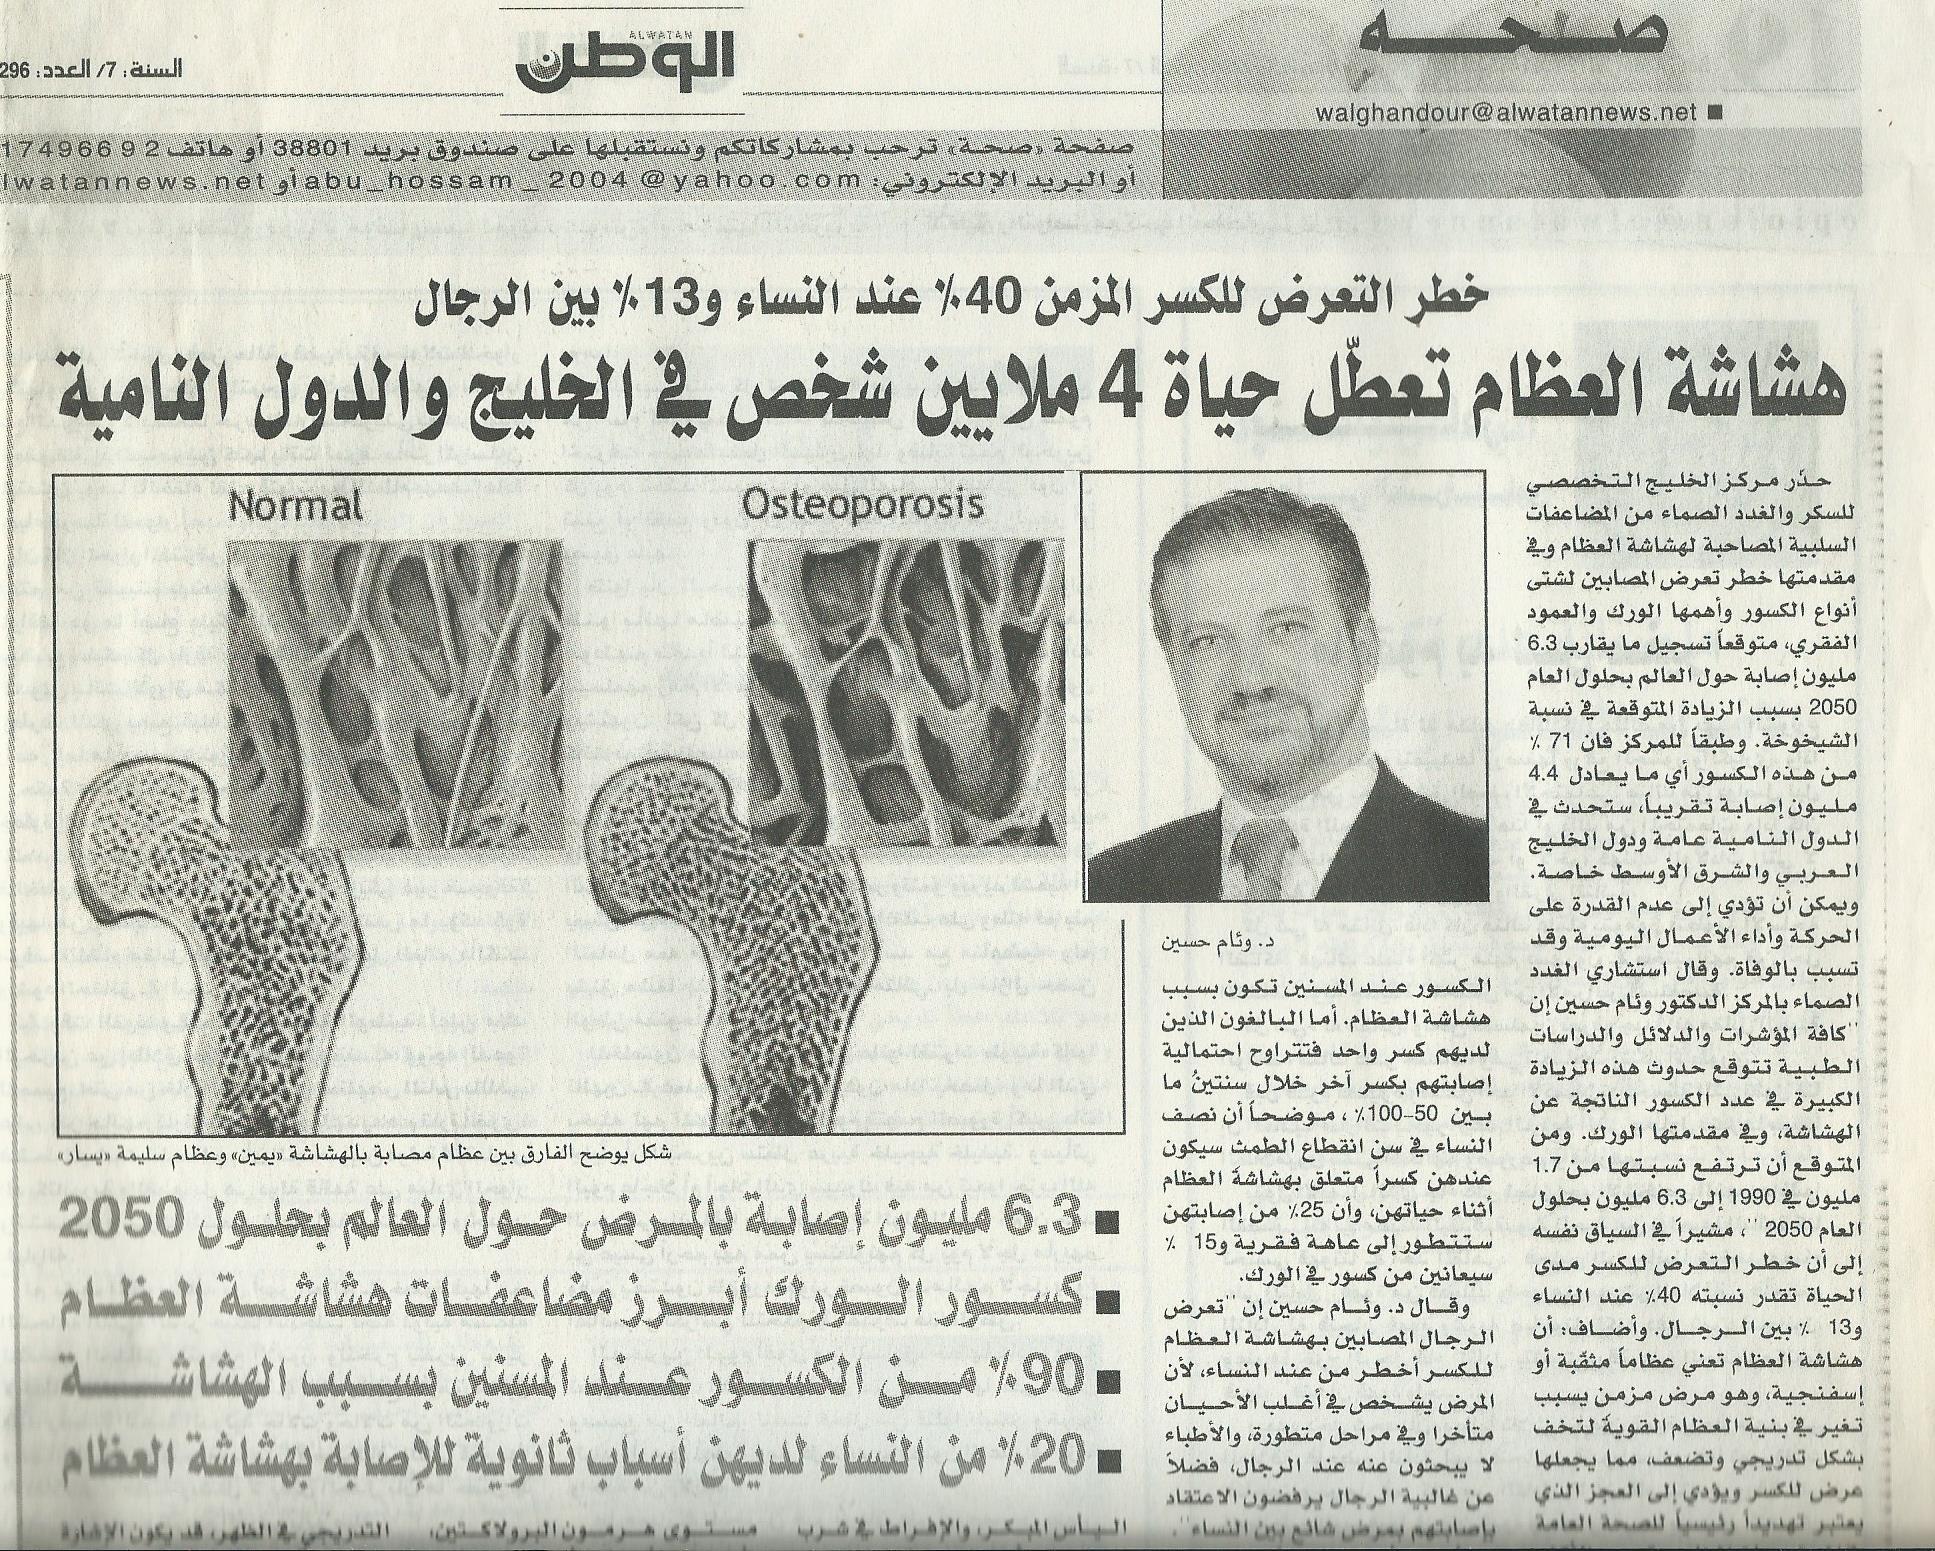 Osteoprosis